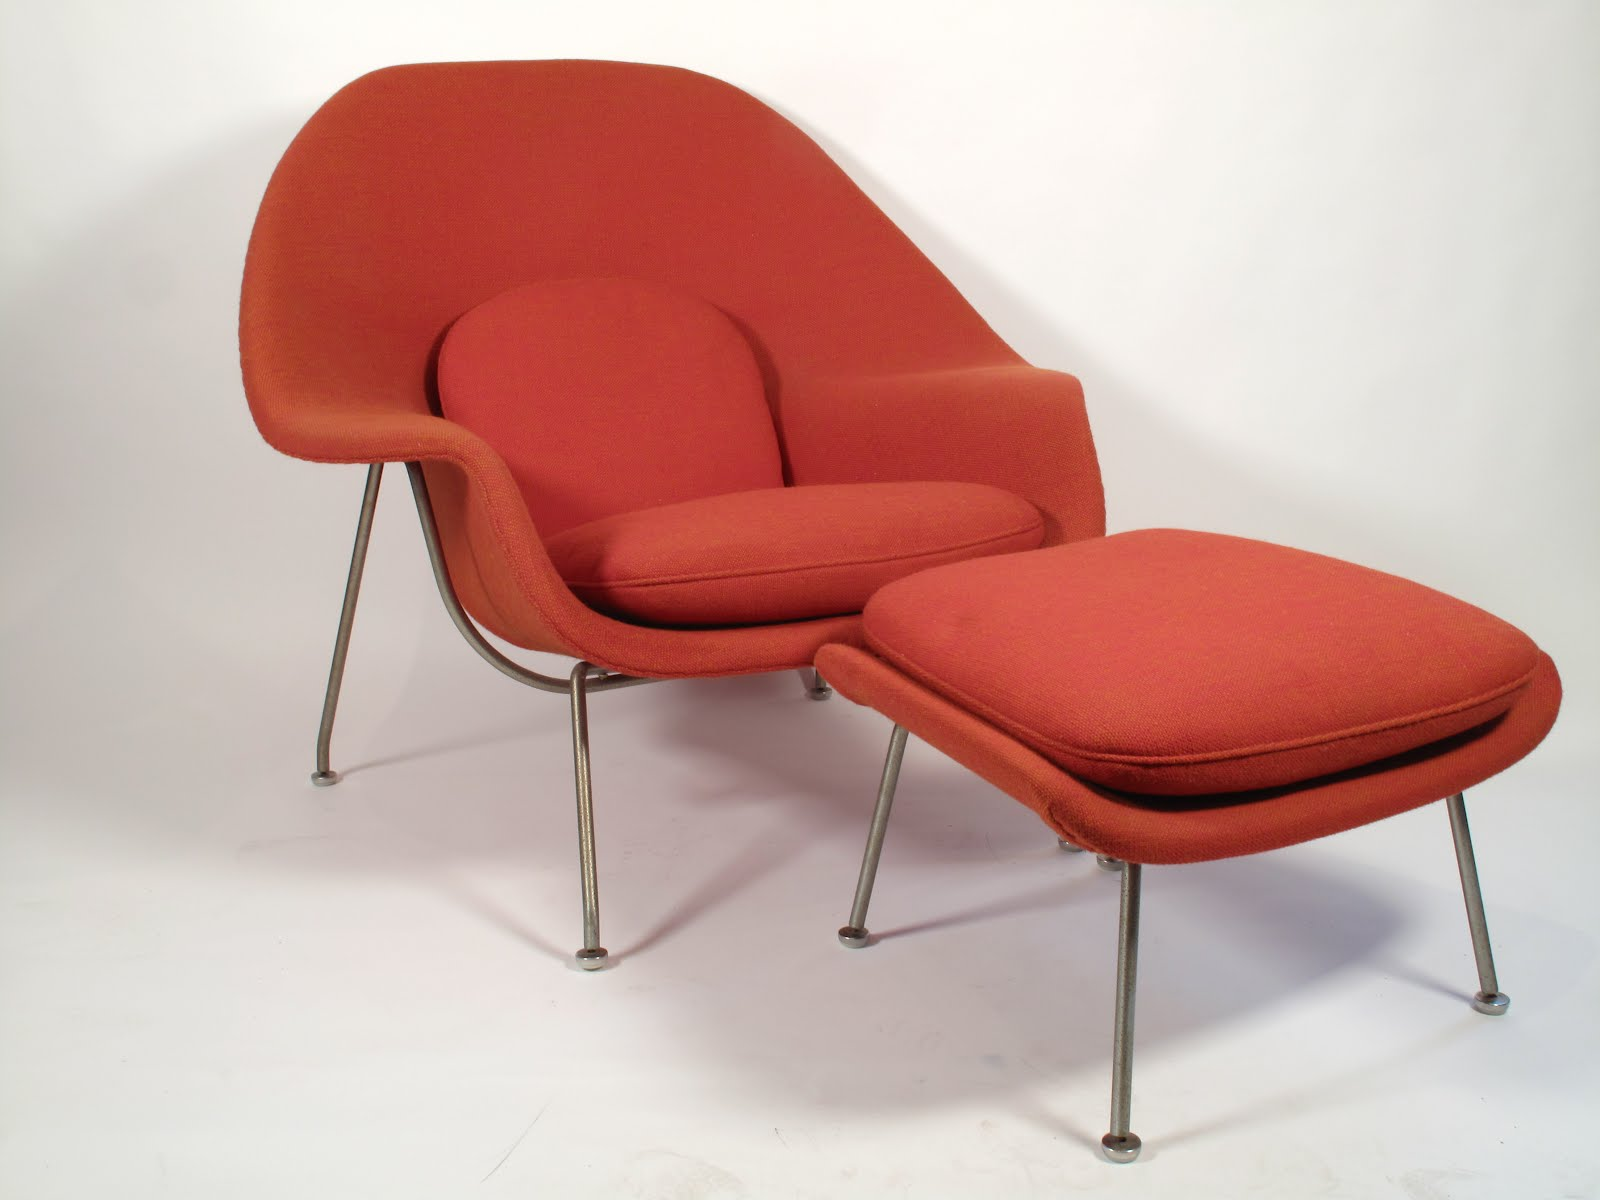 Just in Modern: Eero Saarinen Womb Chair & Ottoman 1960s